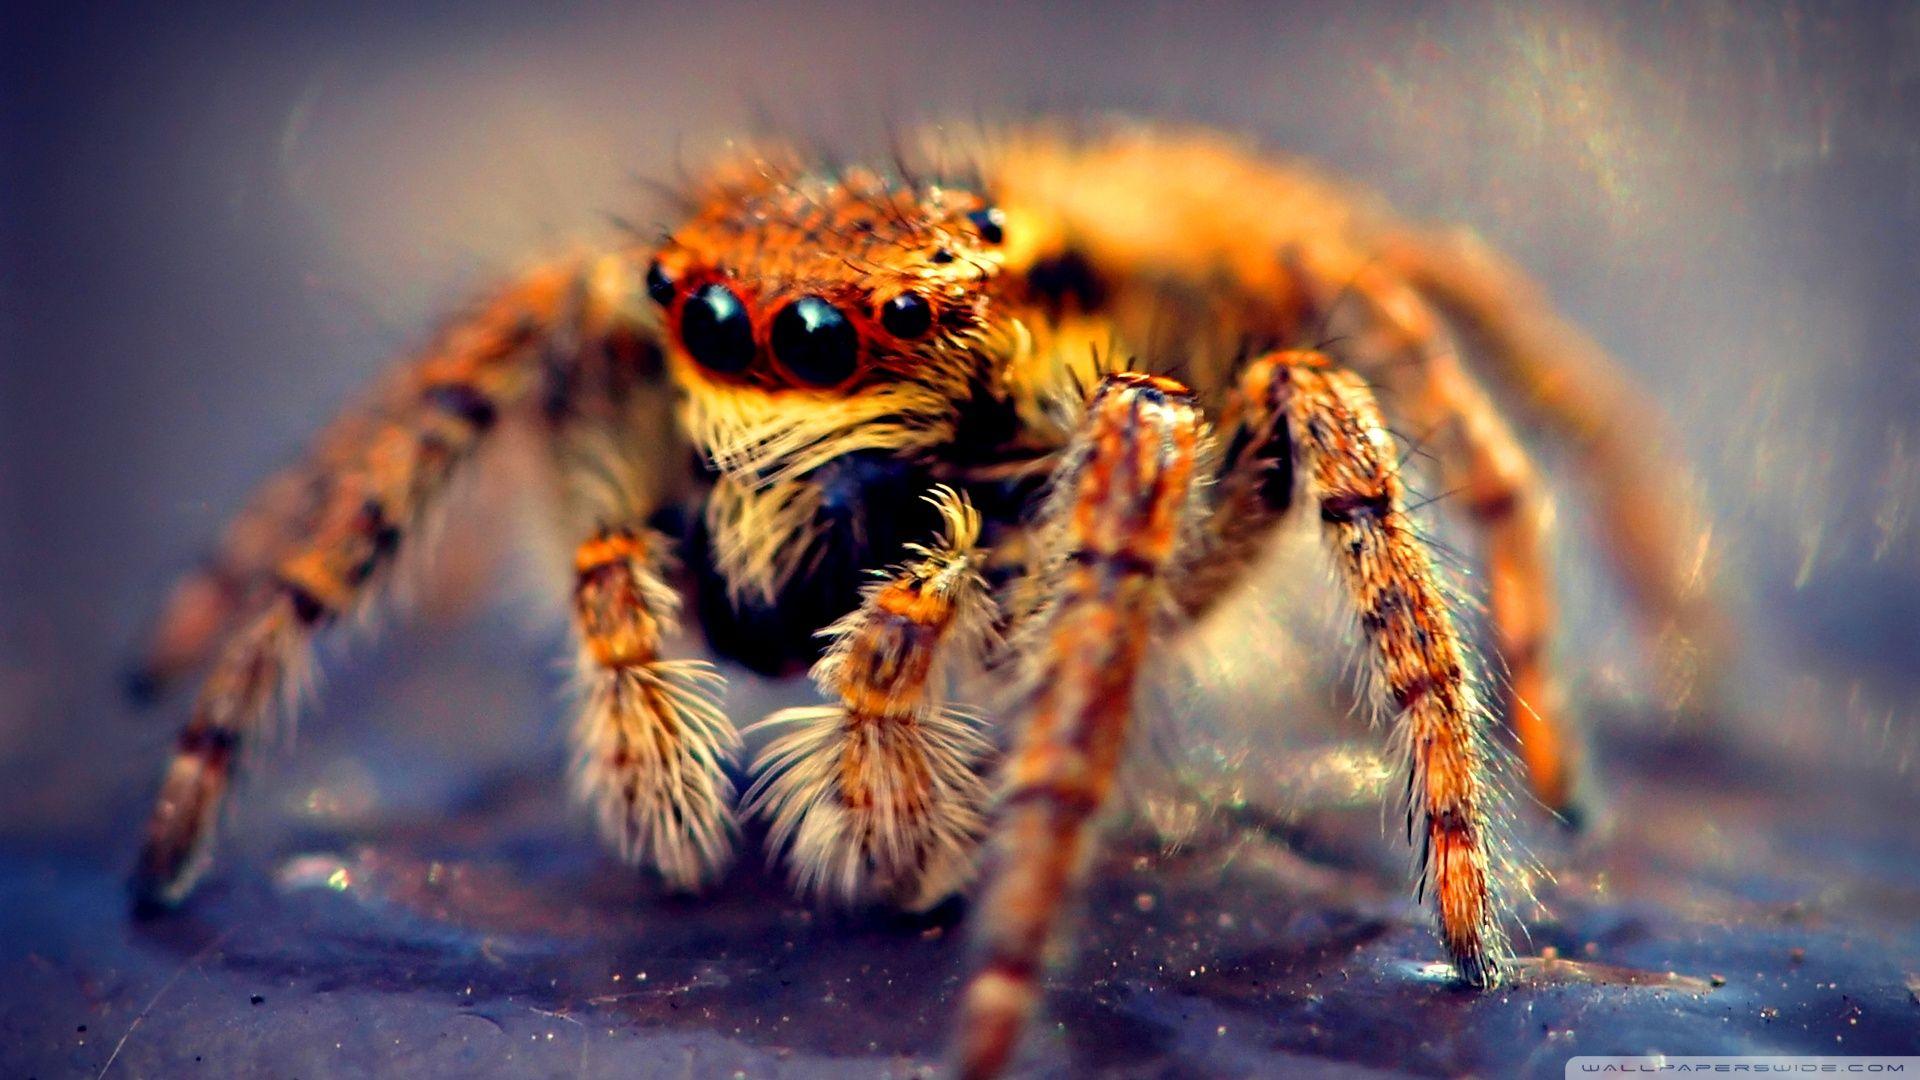 Spider Animal Wallpaper Spider Eyes Wallpaper